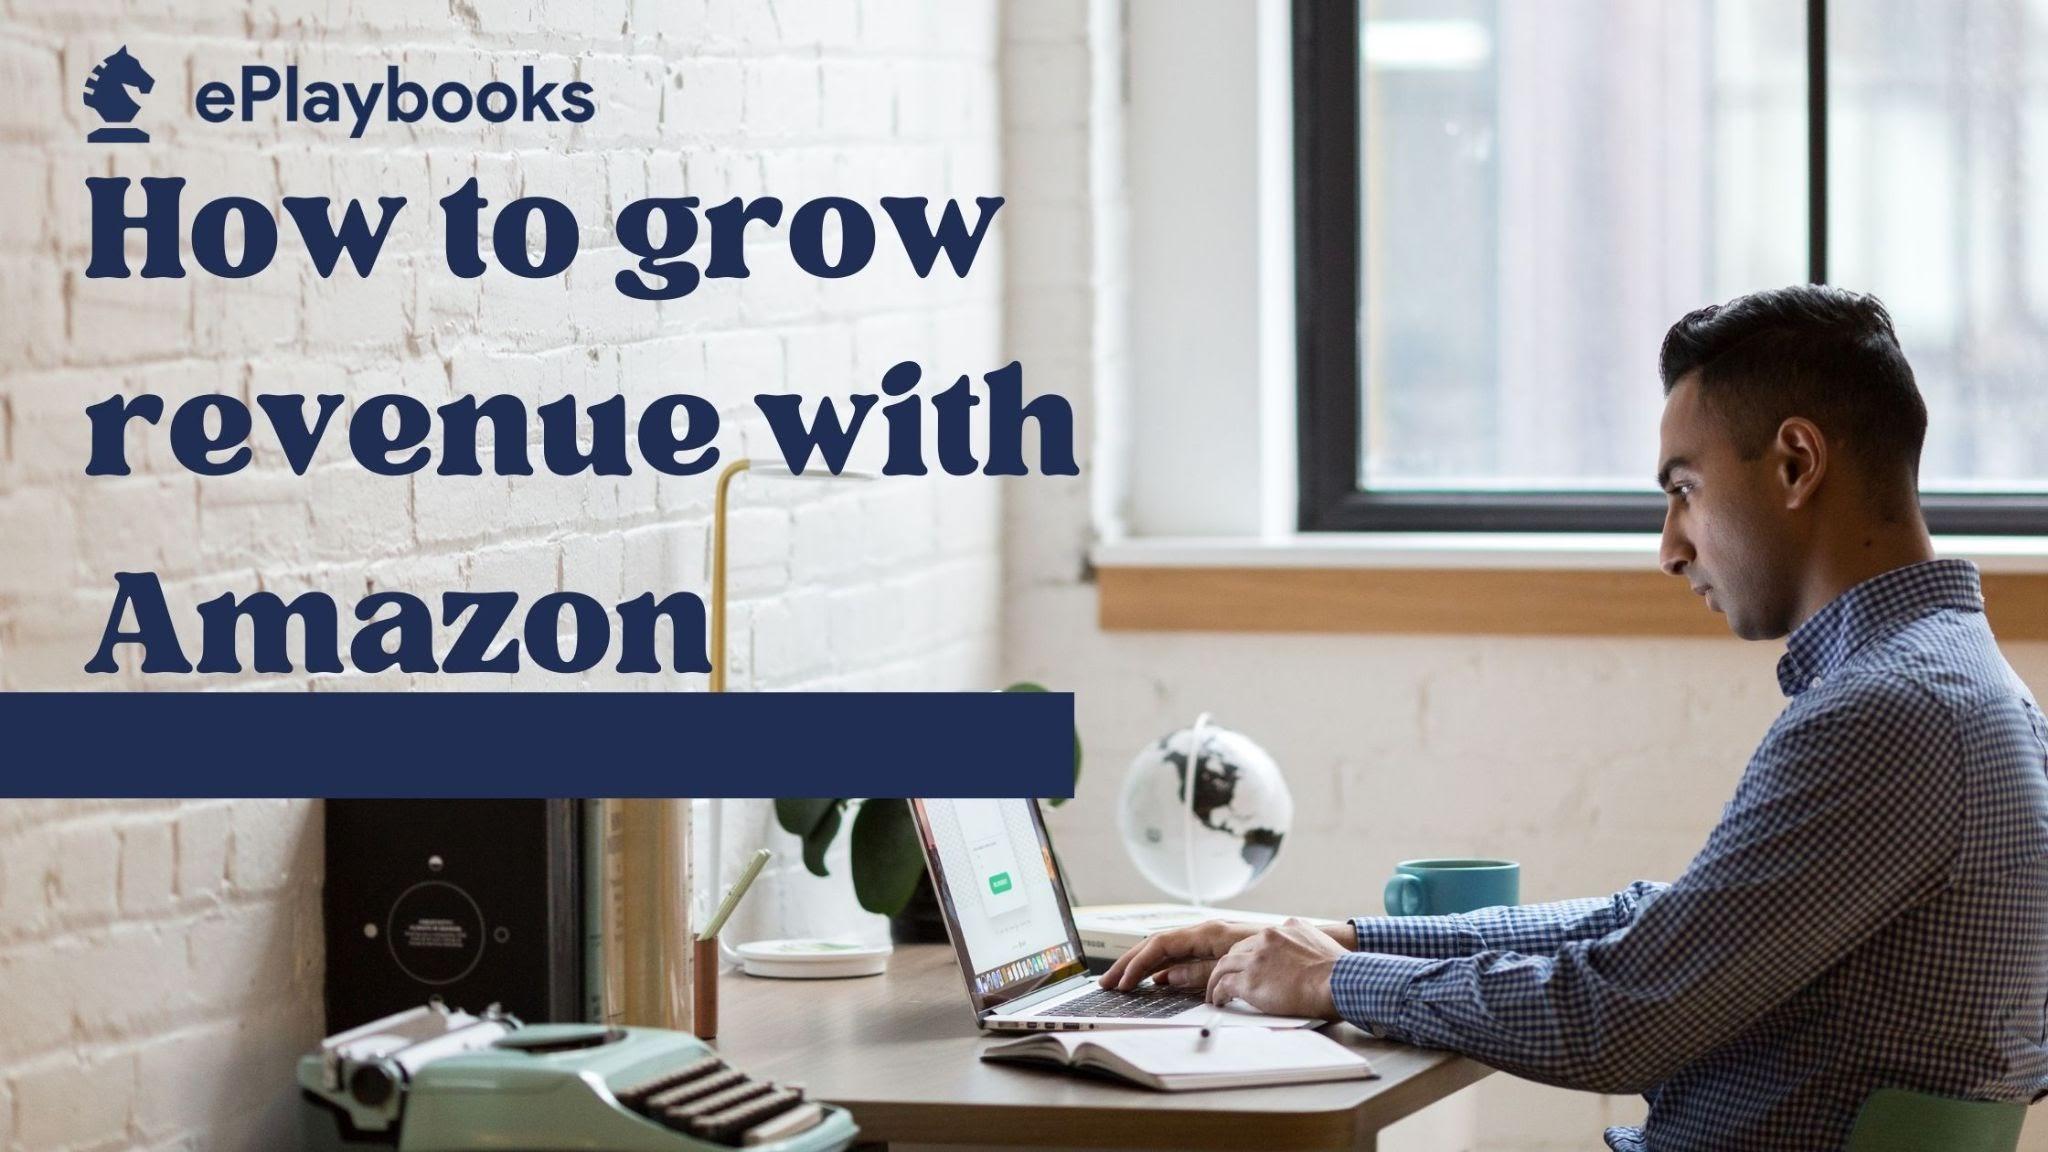 How to grow revenue with Amazon